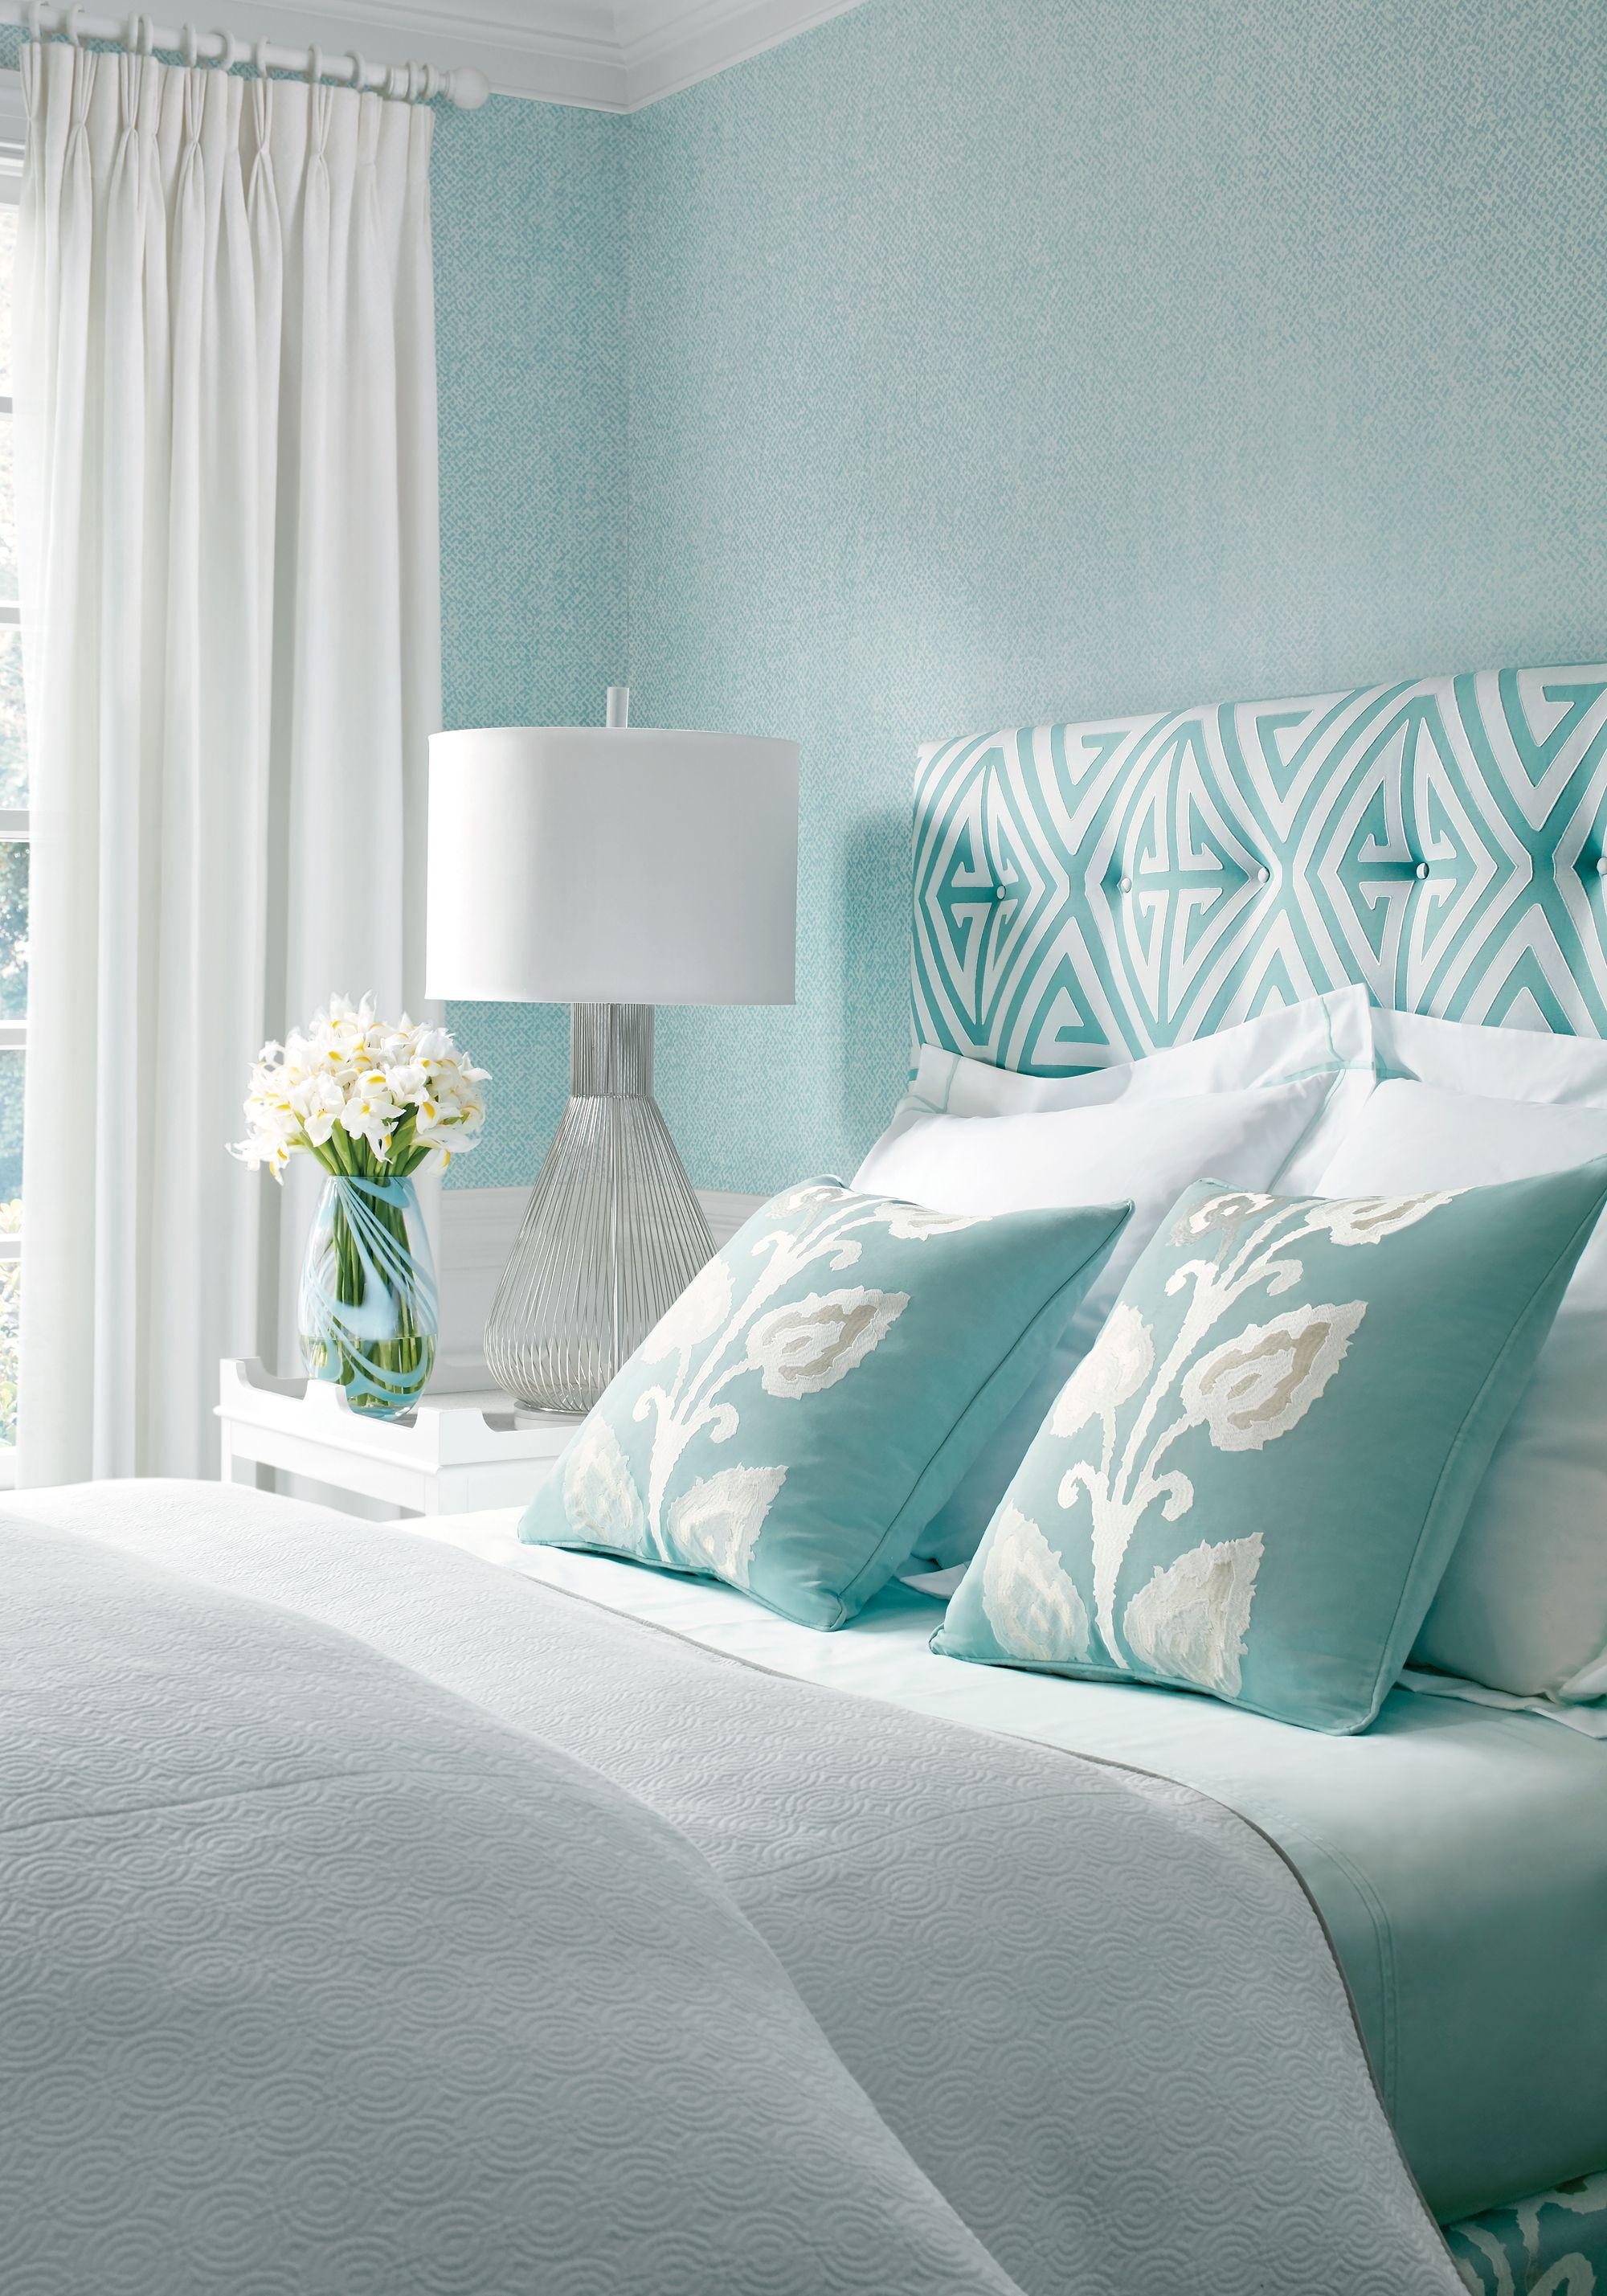 Best Colores Para La Playa Turquoise Room Woman Bedroom 400 x 300